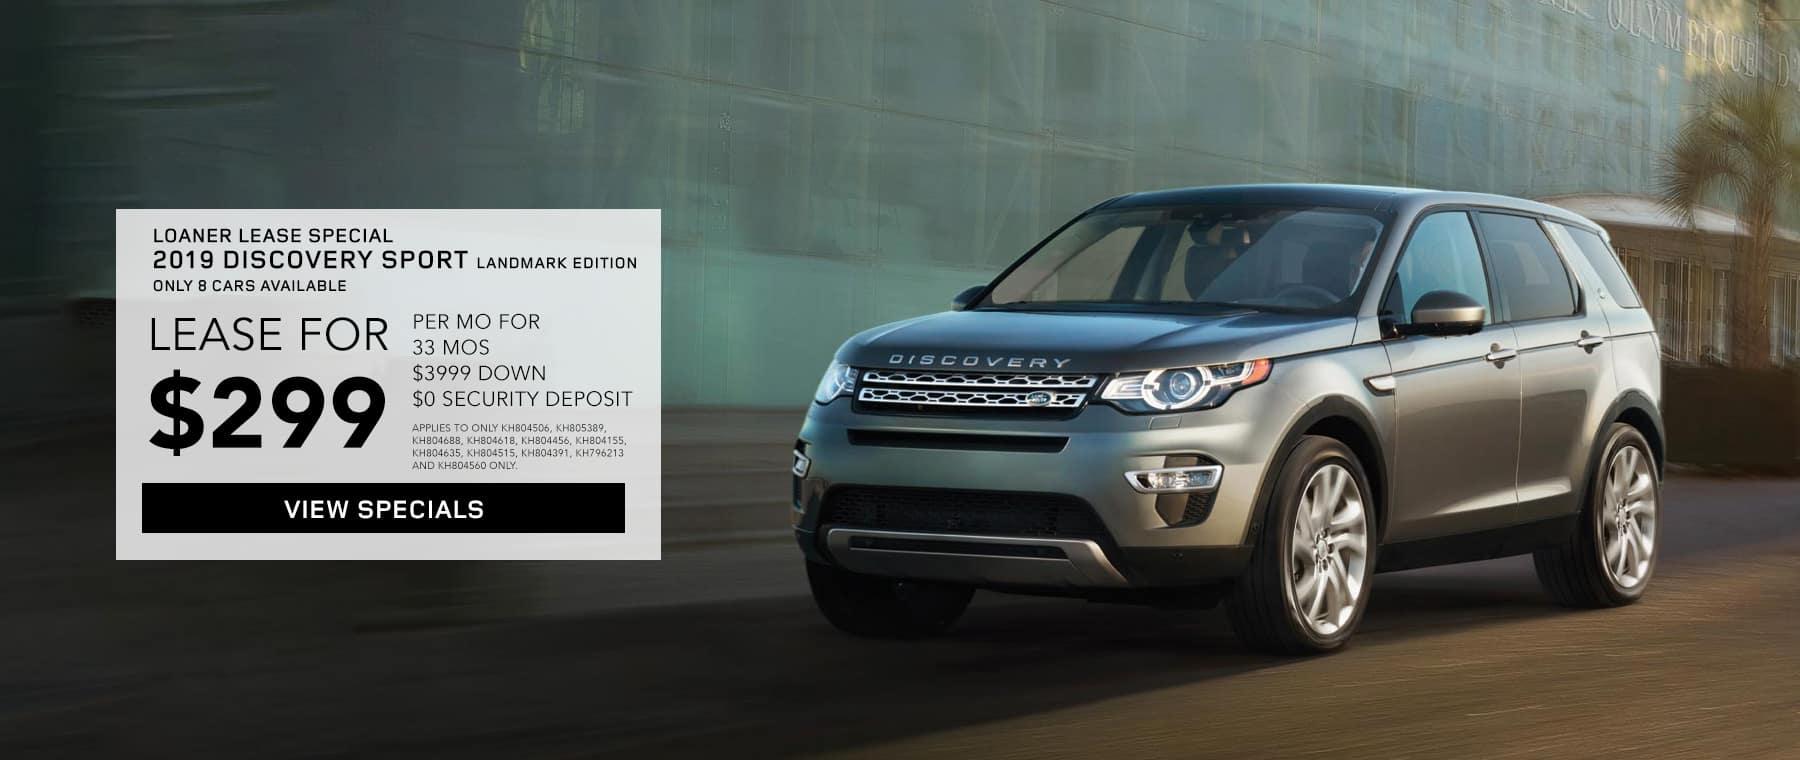 Used Range Rovers >> Land Rover Darien New Used Land Rovers In Darien Ct